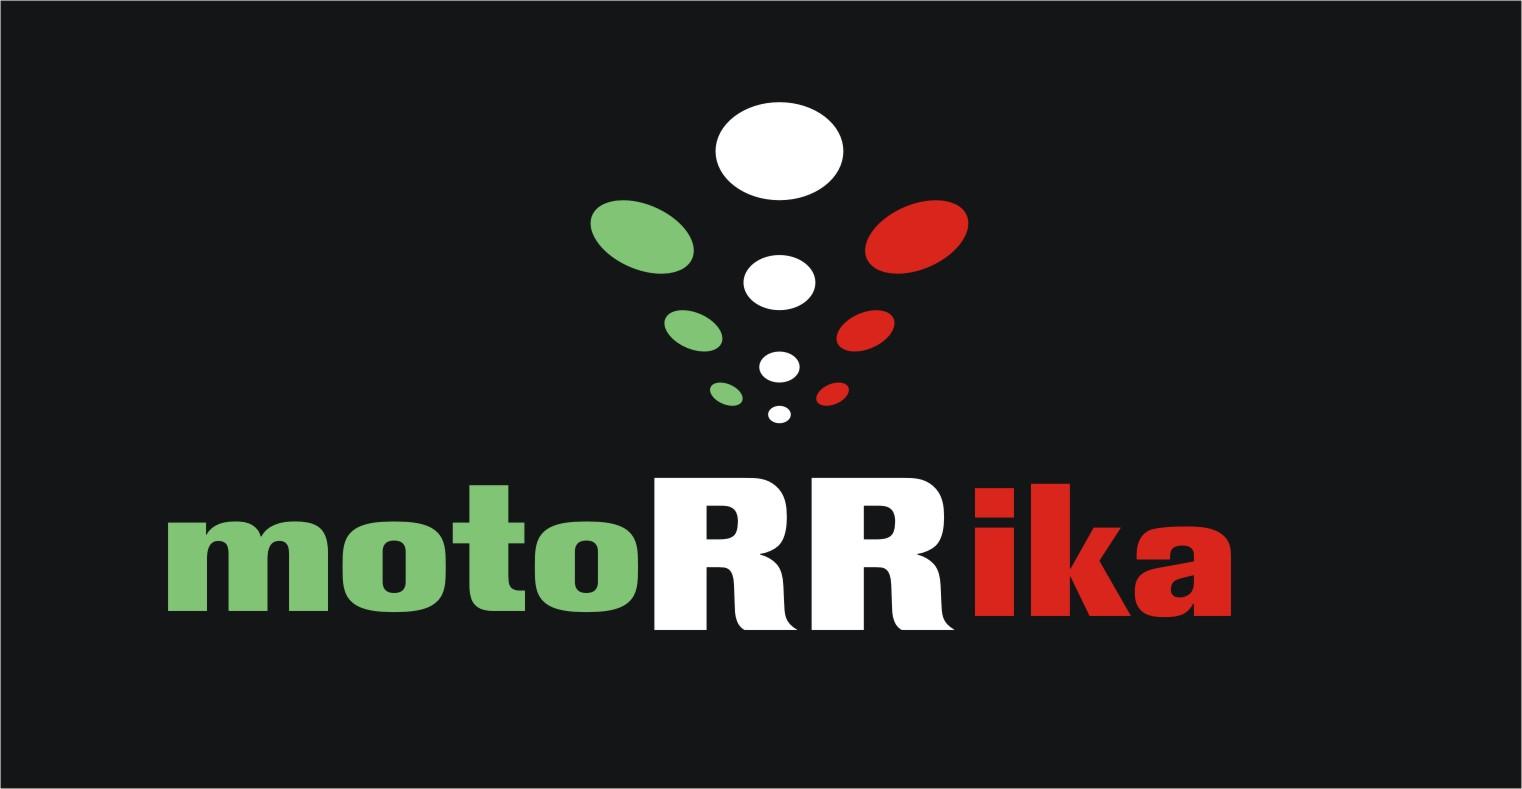 Мотогонки. Логотип, фирменный стиль. фото f_4dbd39f045ae5.jpg